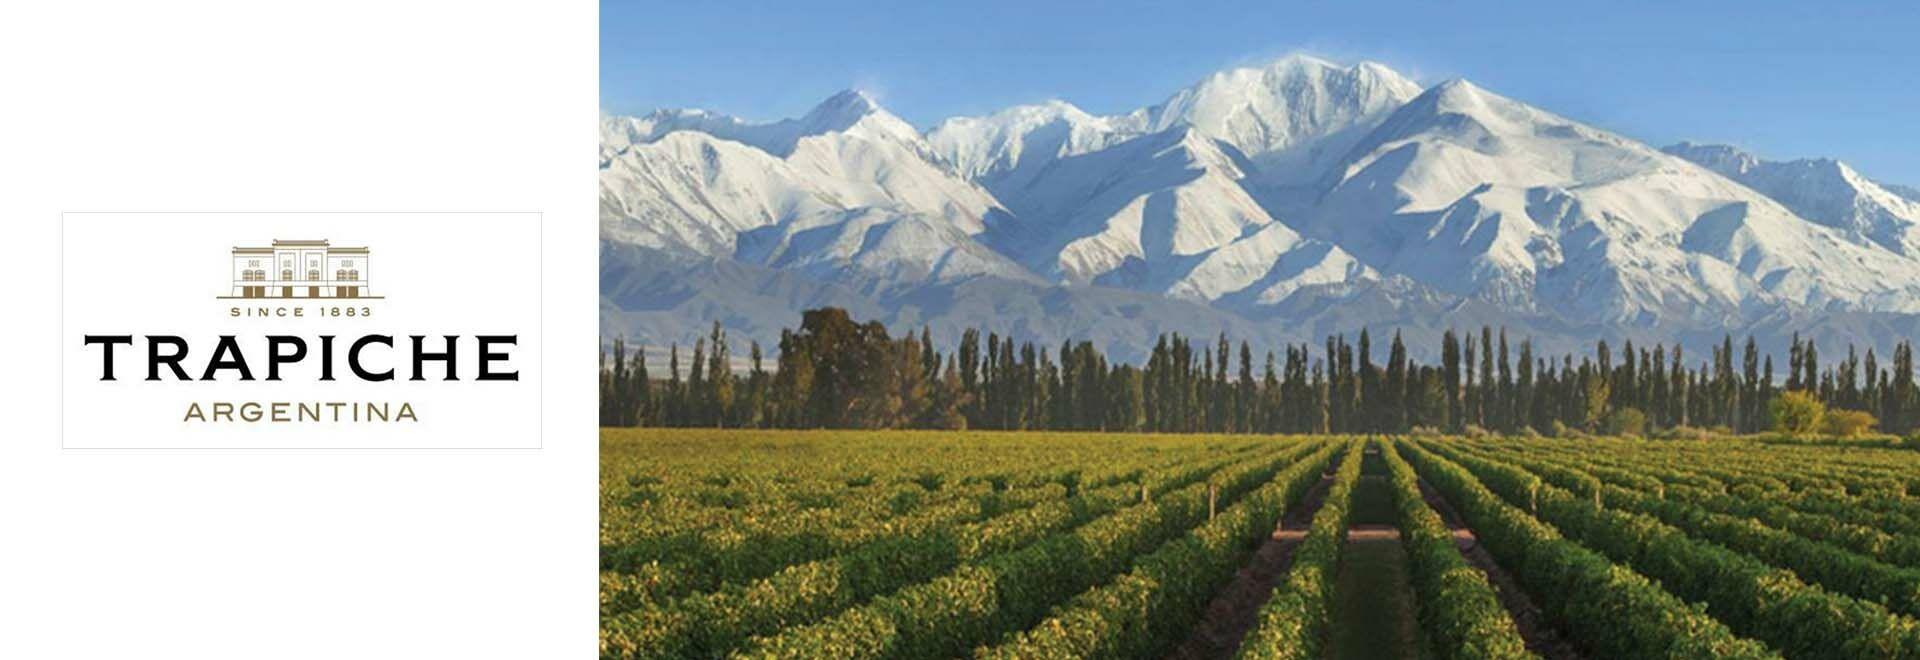 Argentin borok - Trapiche borok - Argentína - Újvilági borok